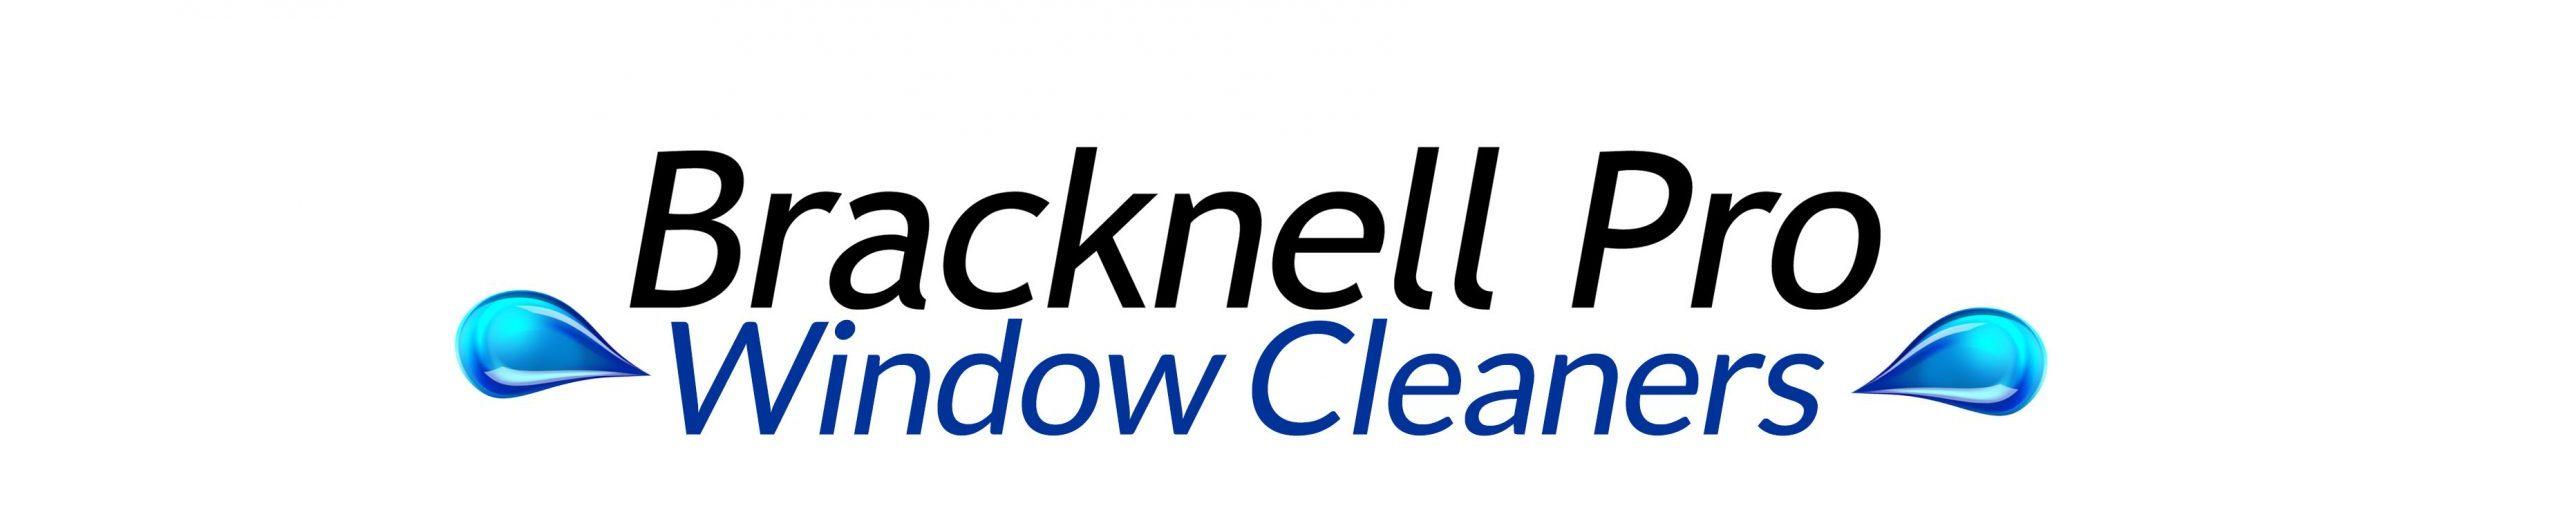 Bracknell Pro Window Cleaners